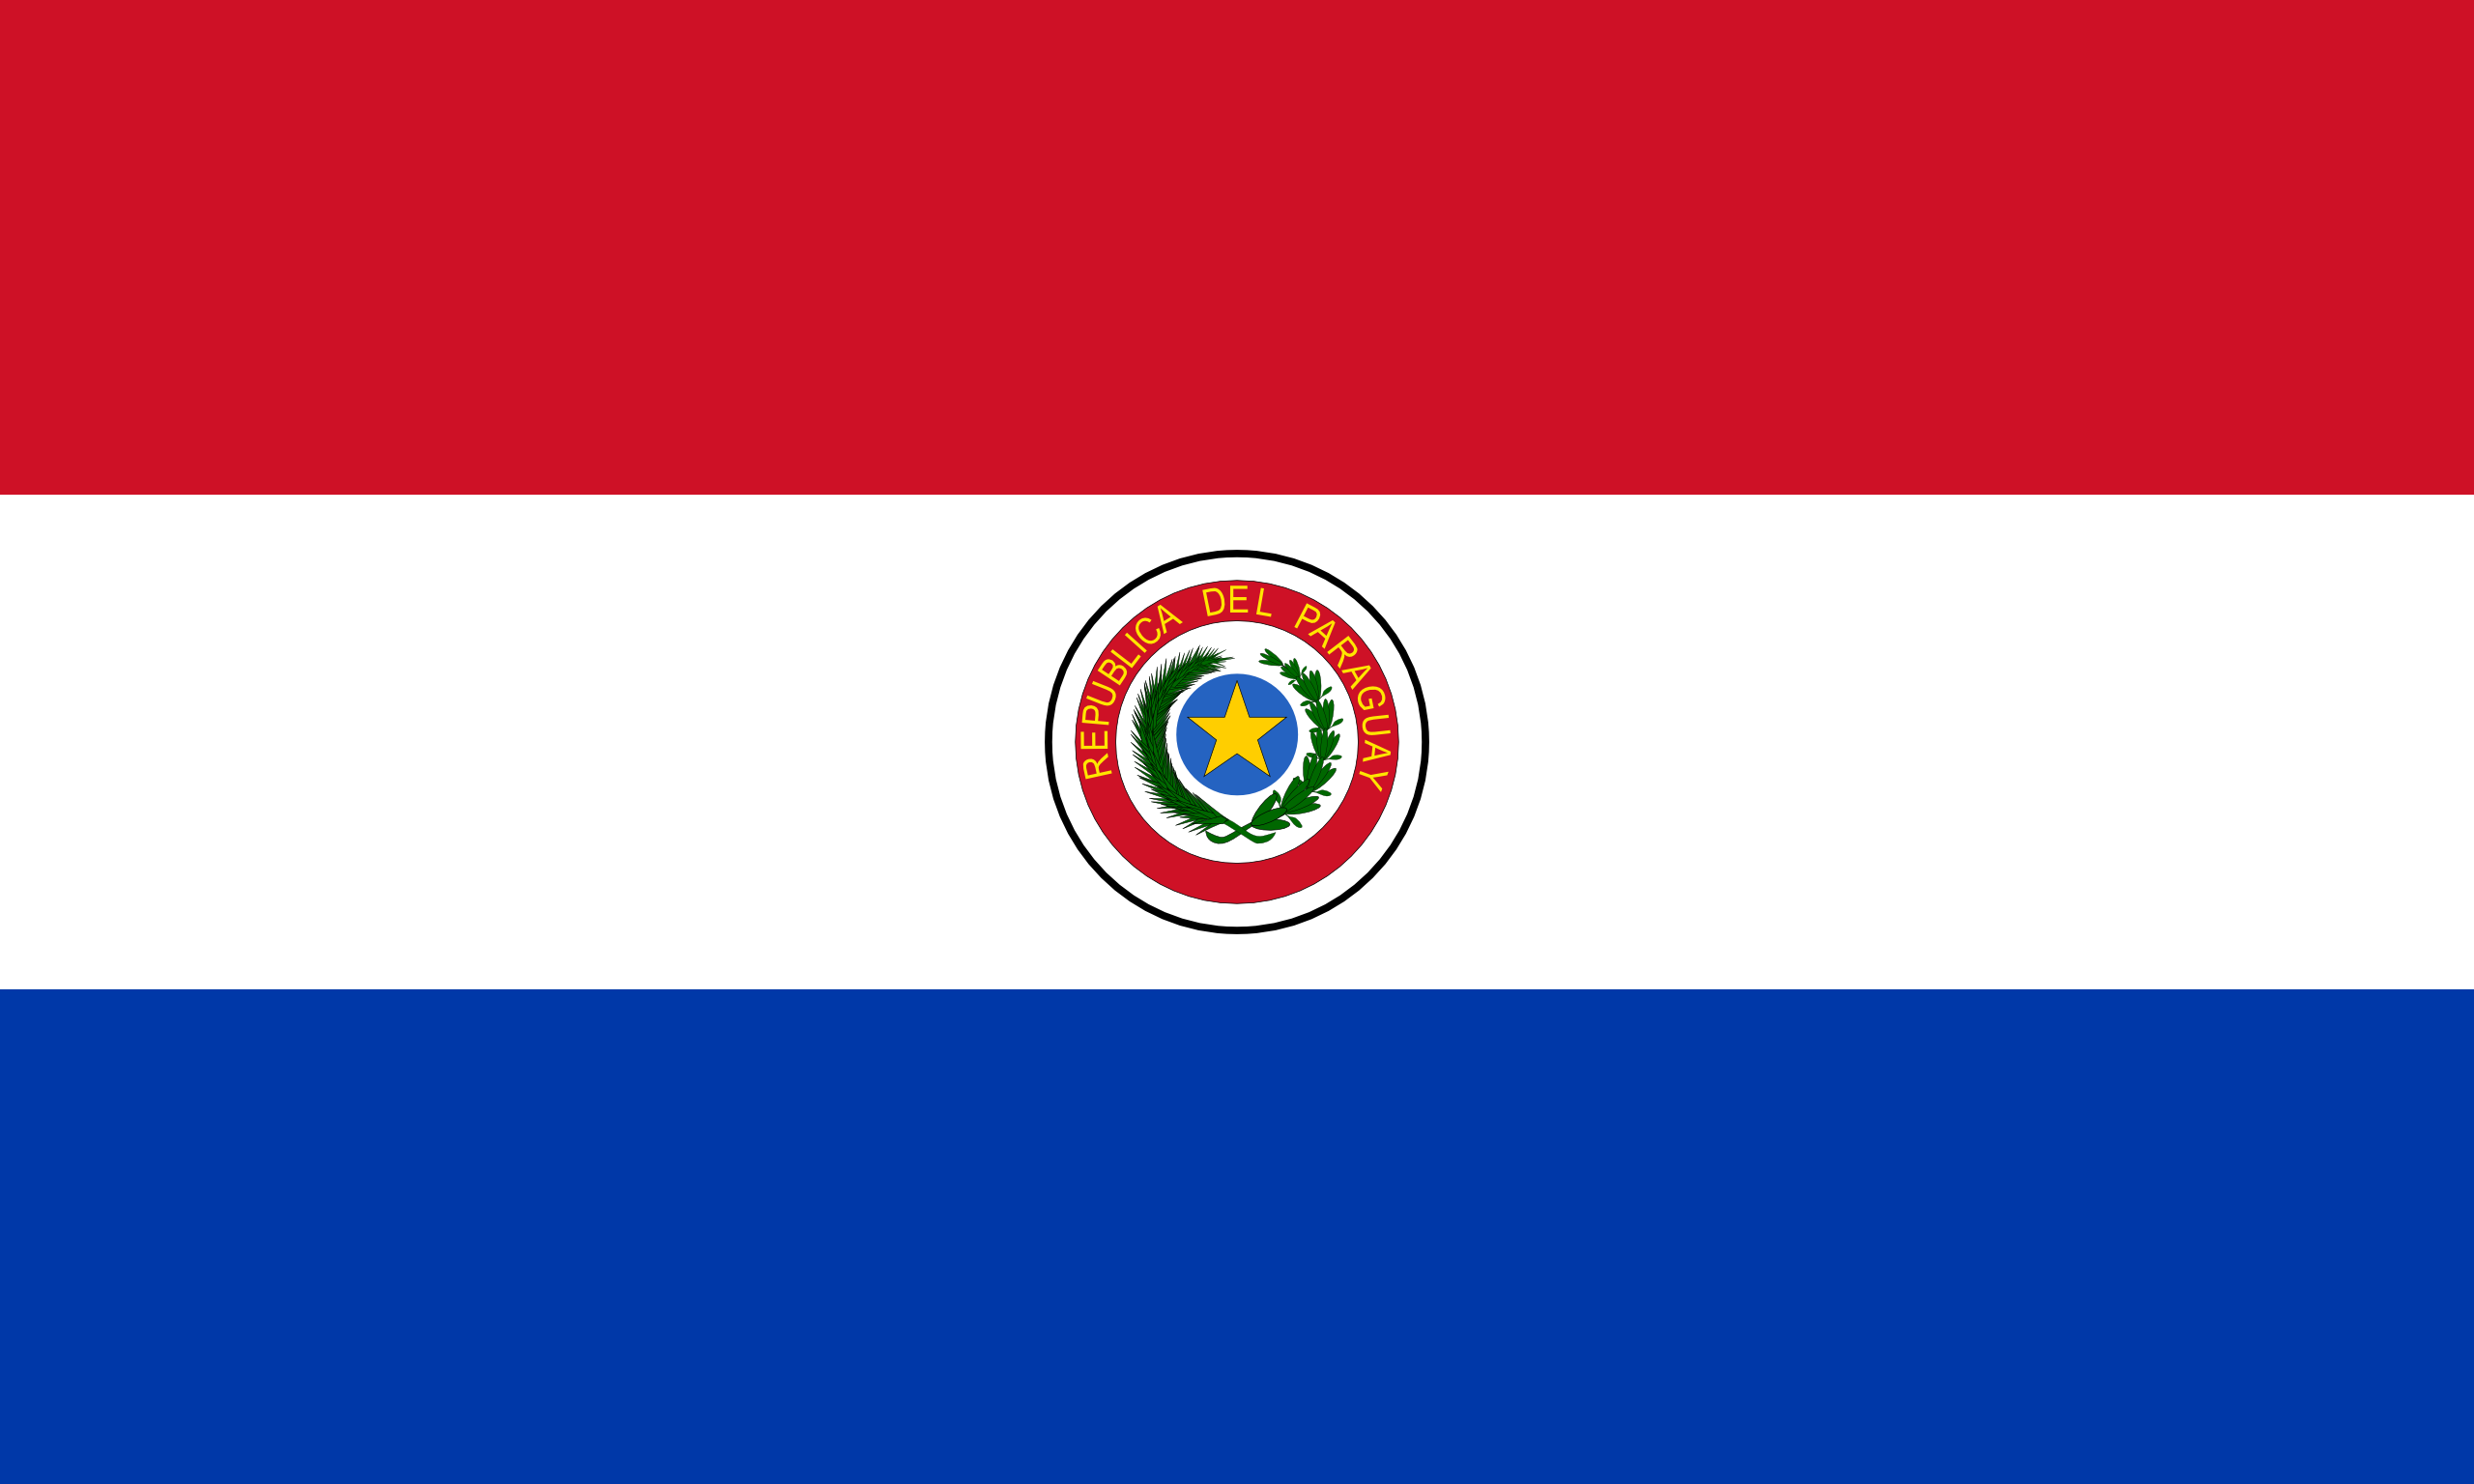 Парагвай, страна, Эмблема, логотип, символ - Обои HD - Профессор falken.com